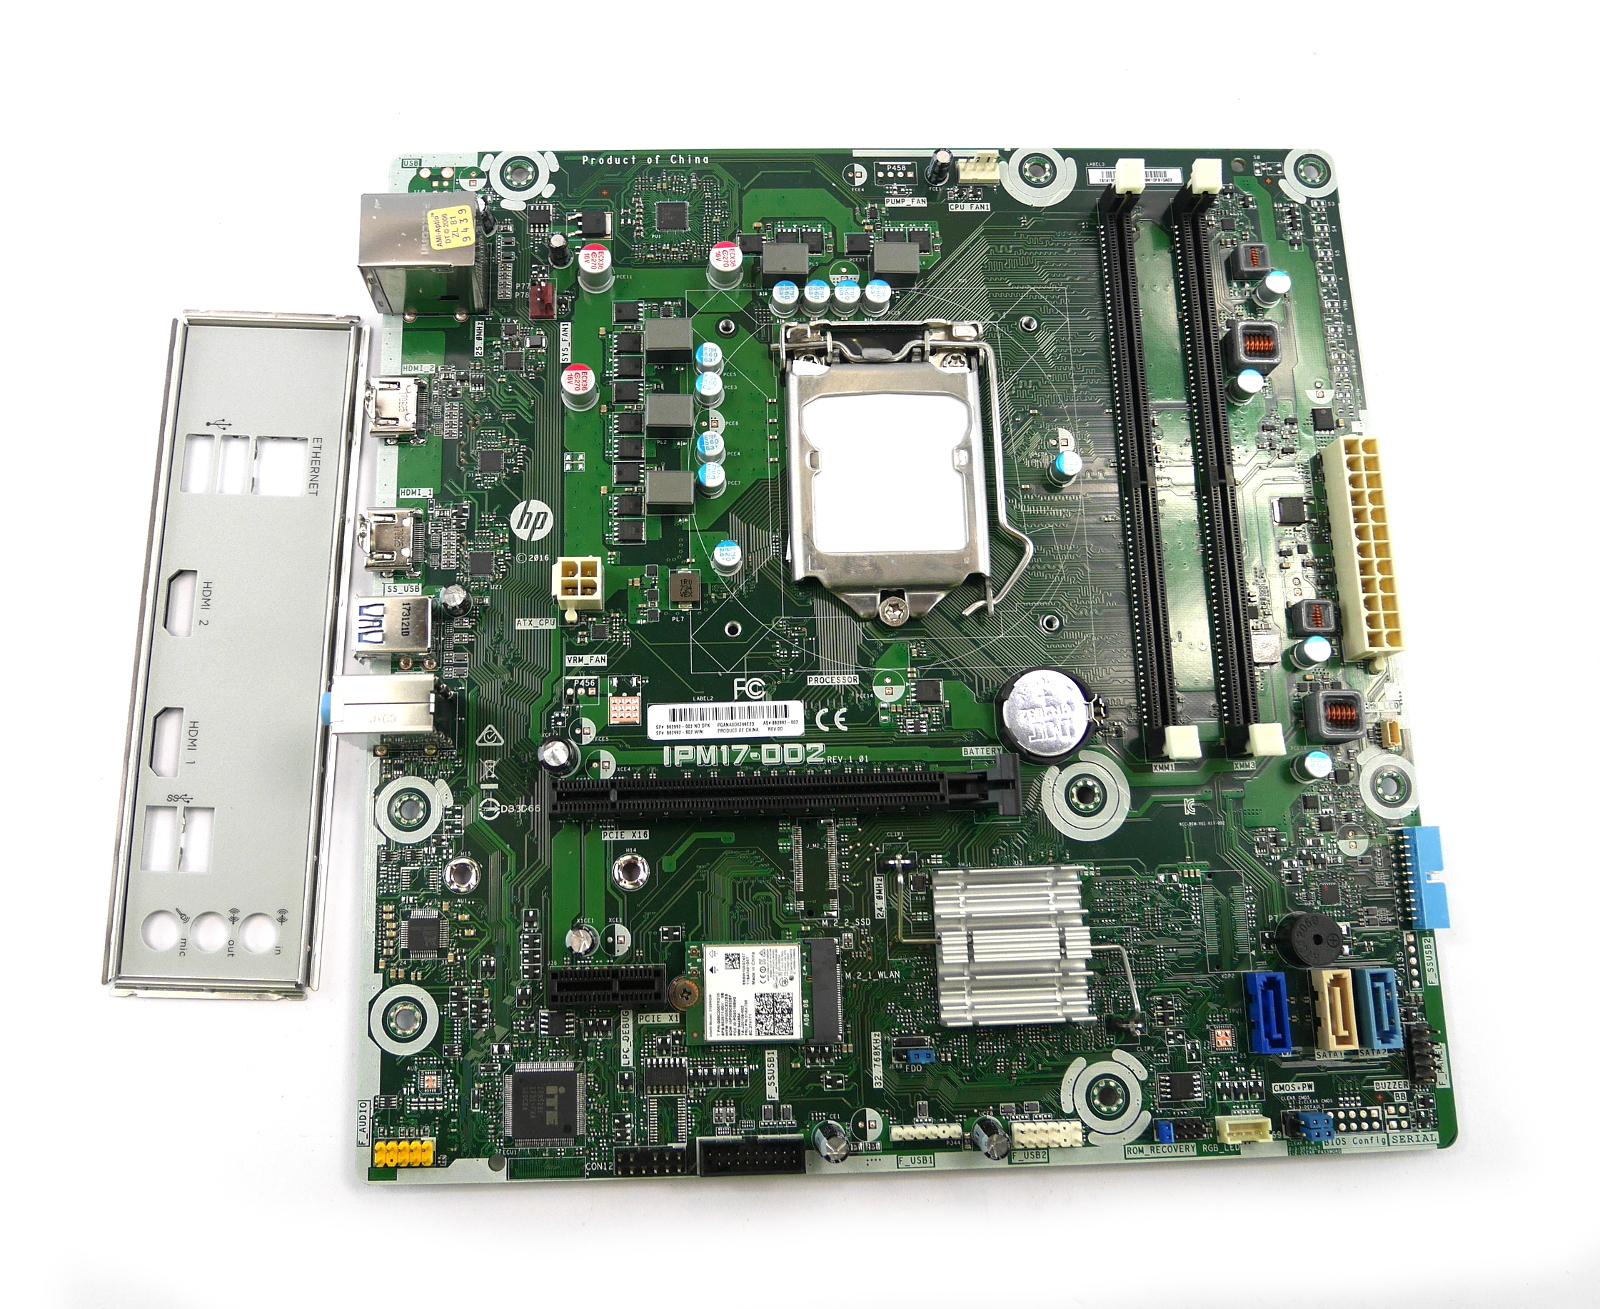 HP Omen 862992-002 IPM17-002 Motherboard LGA1150